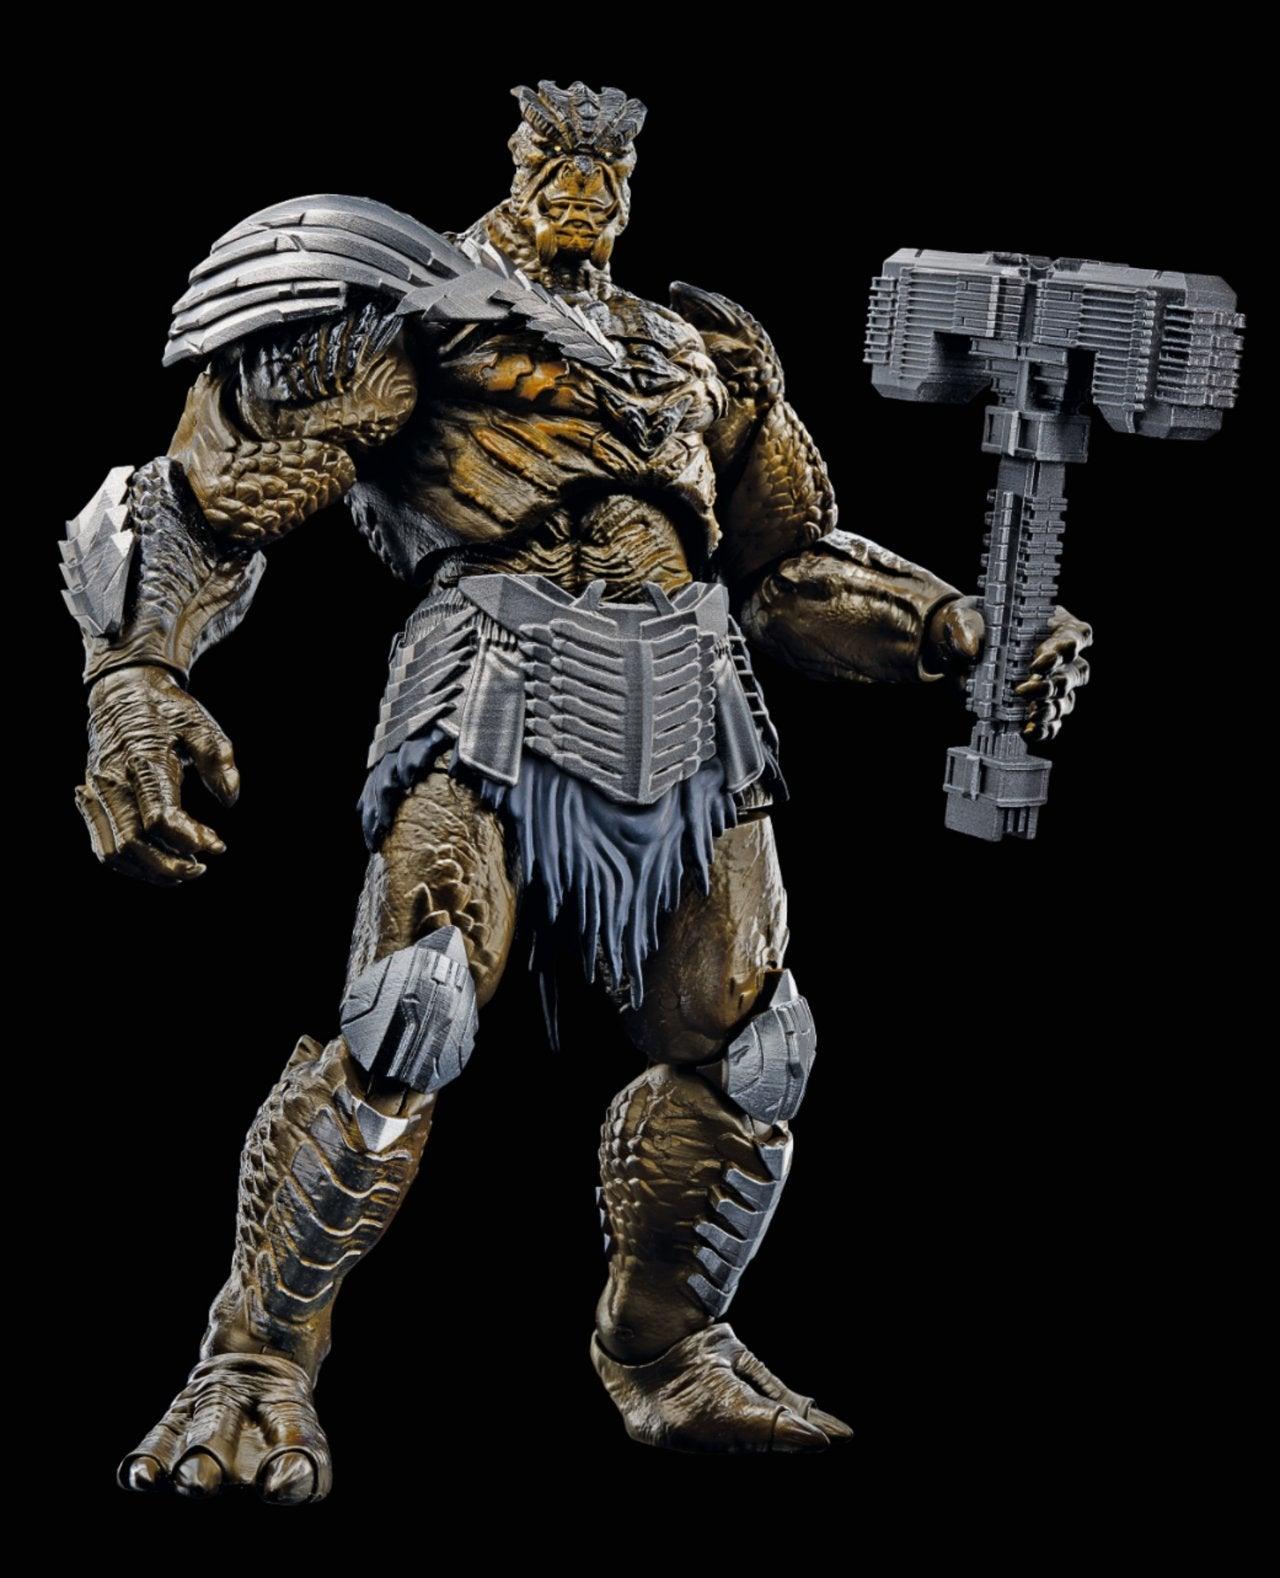 Avengers Infinity War Hasbro Figures - Cull Obsidian